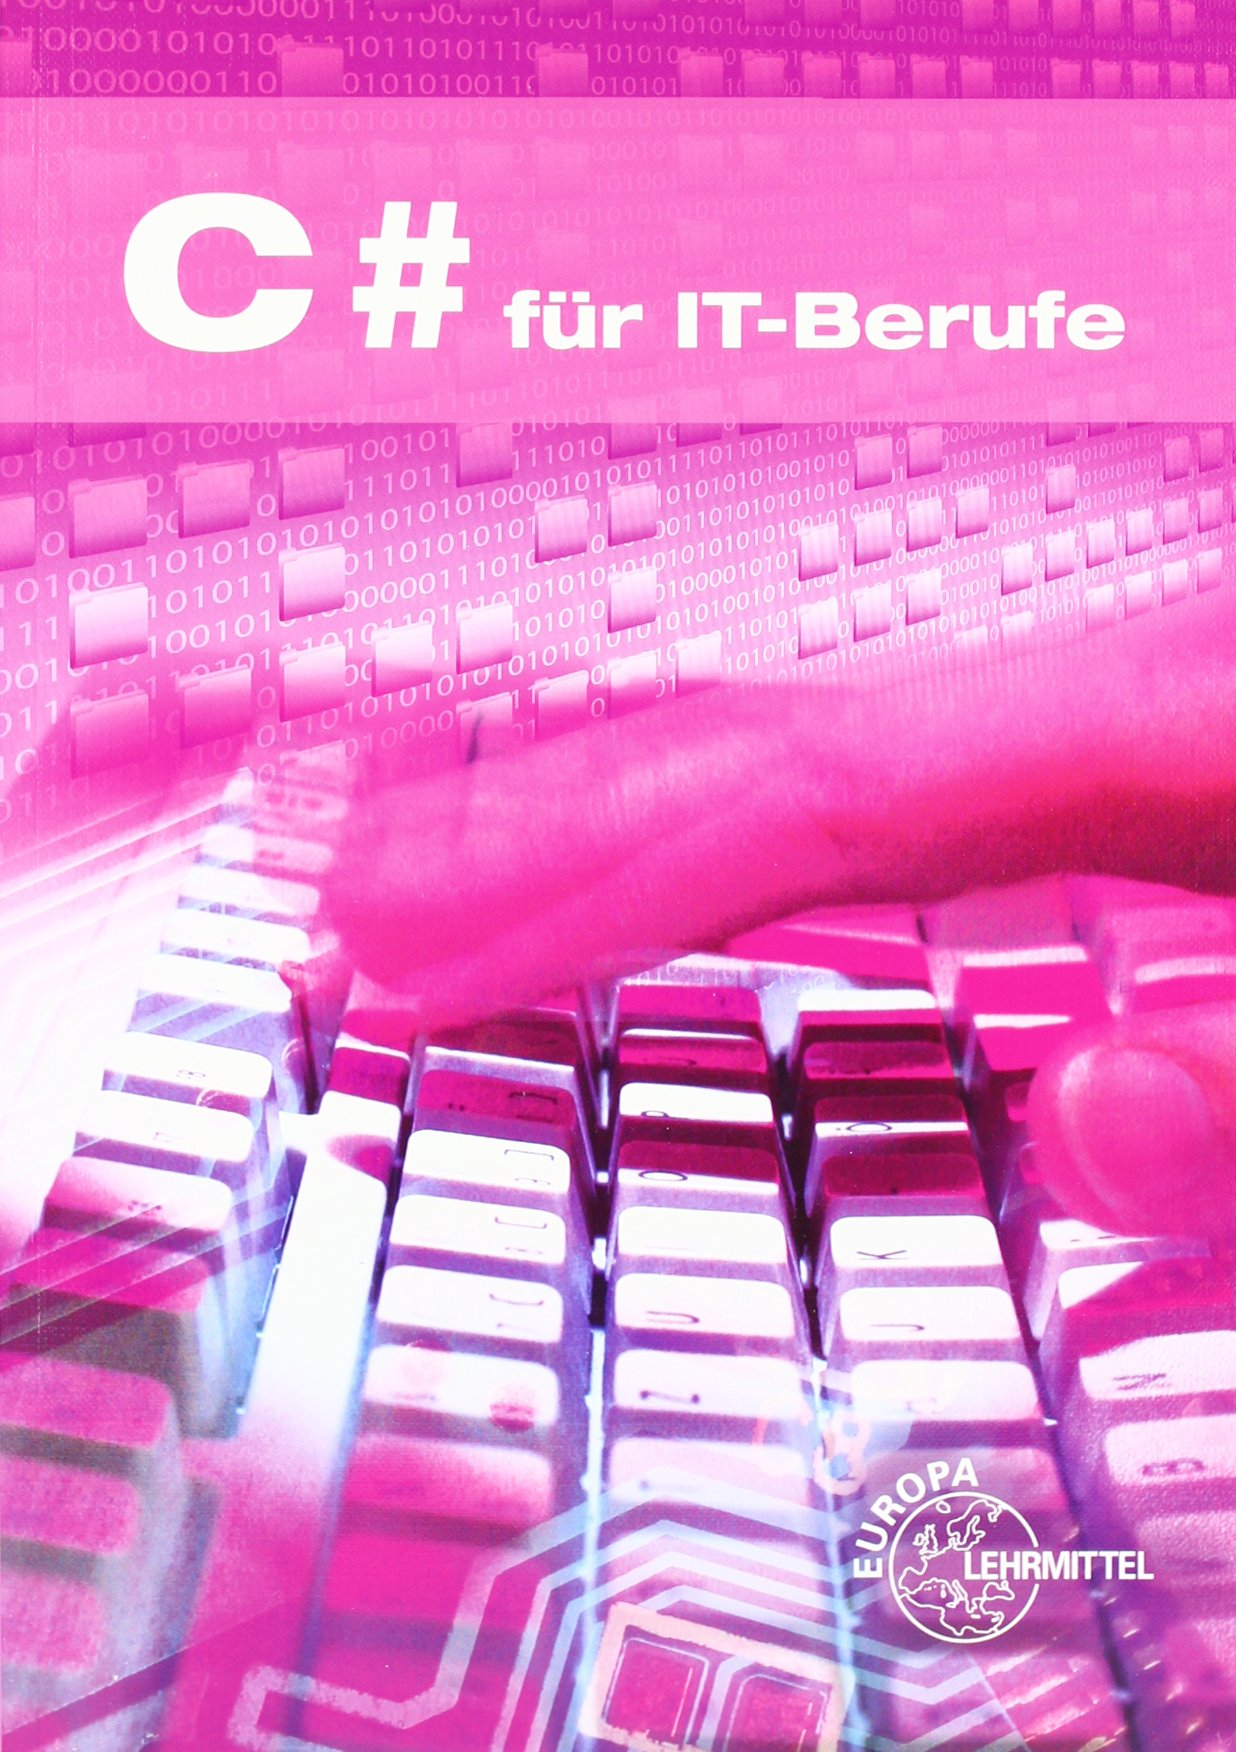 C# für IT-Berufe